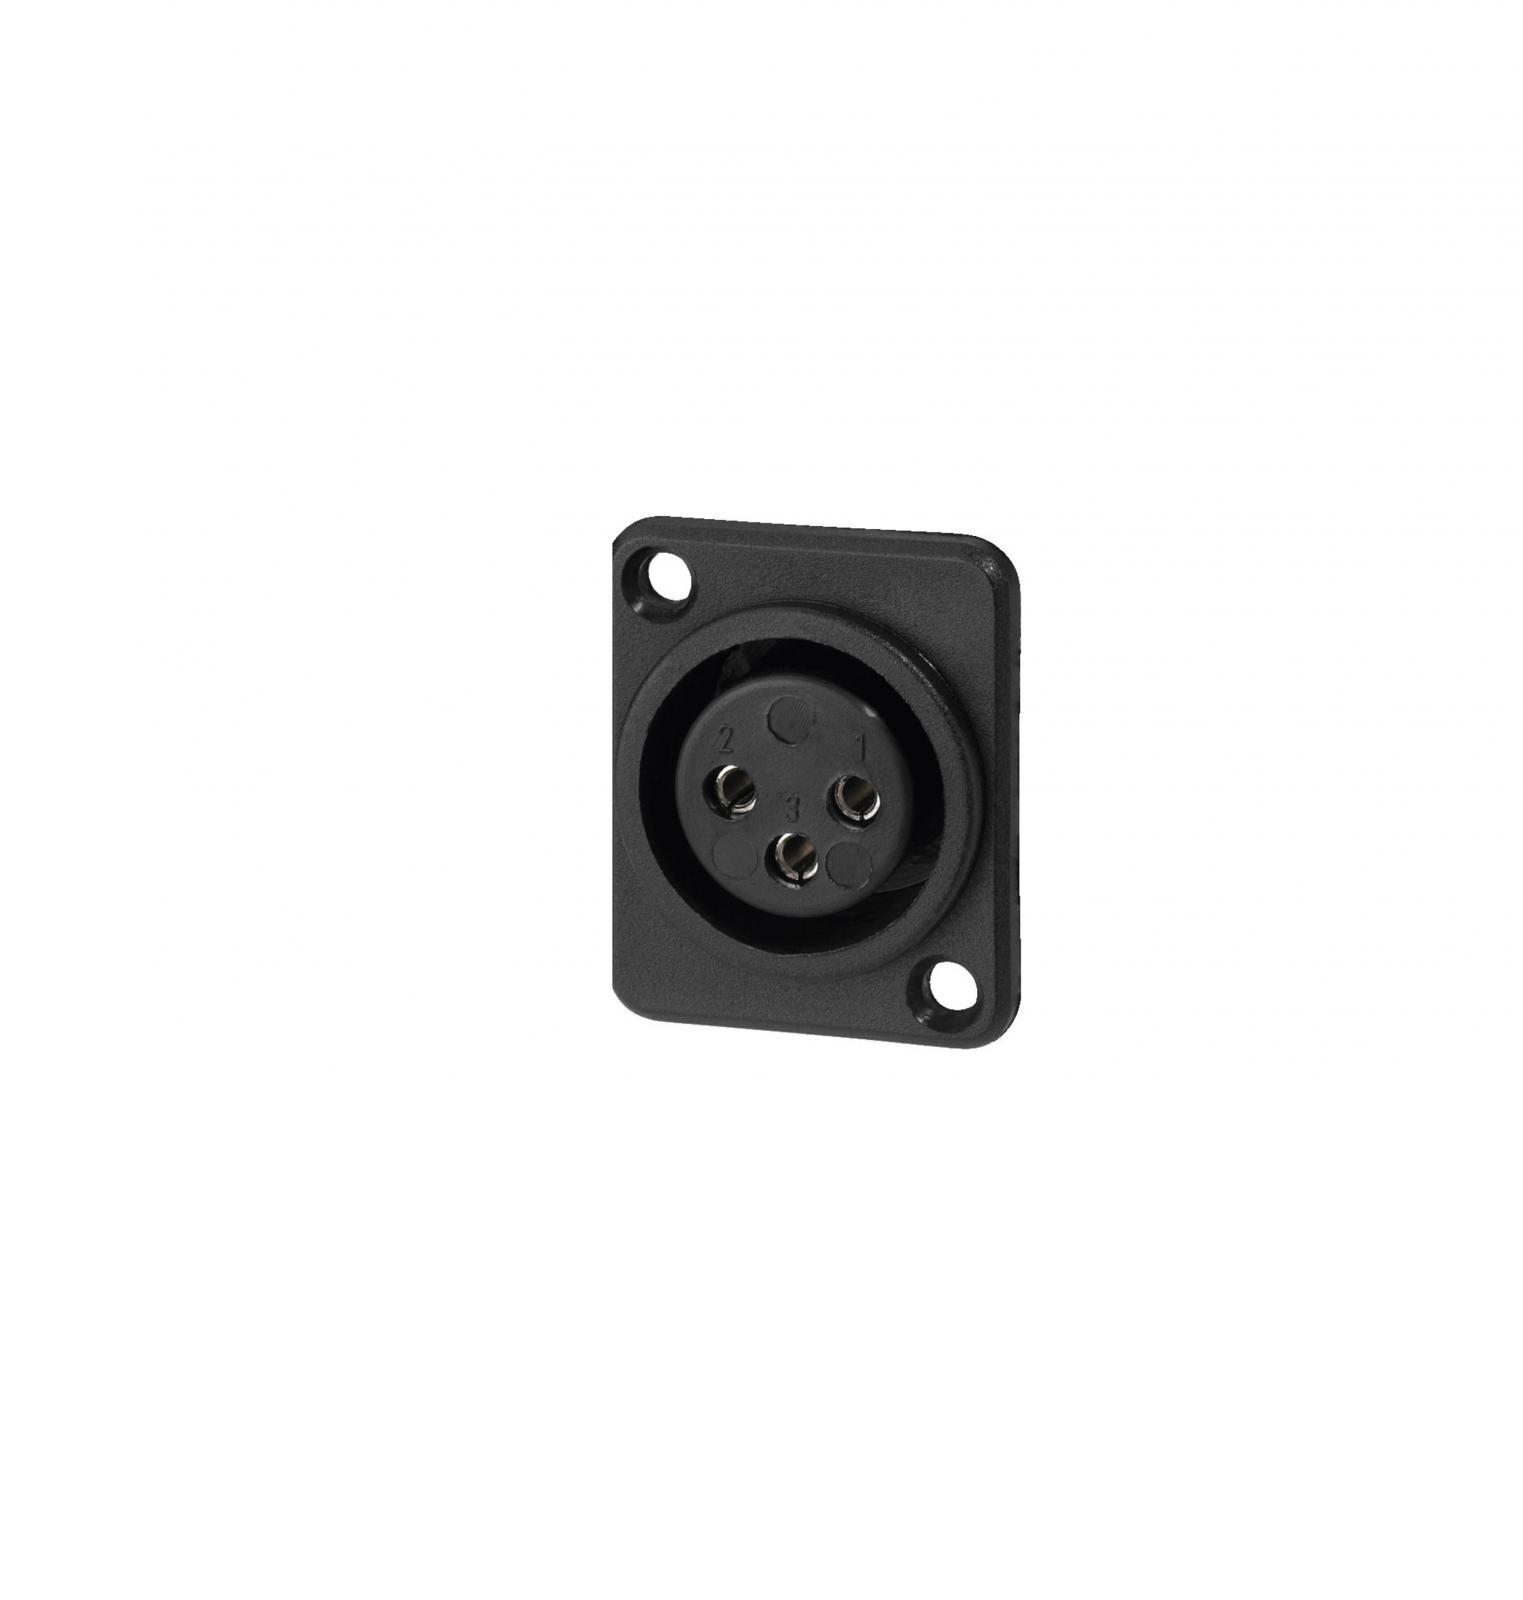 Conector Xlr Chasis Hembra Xlr-508/J